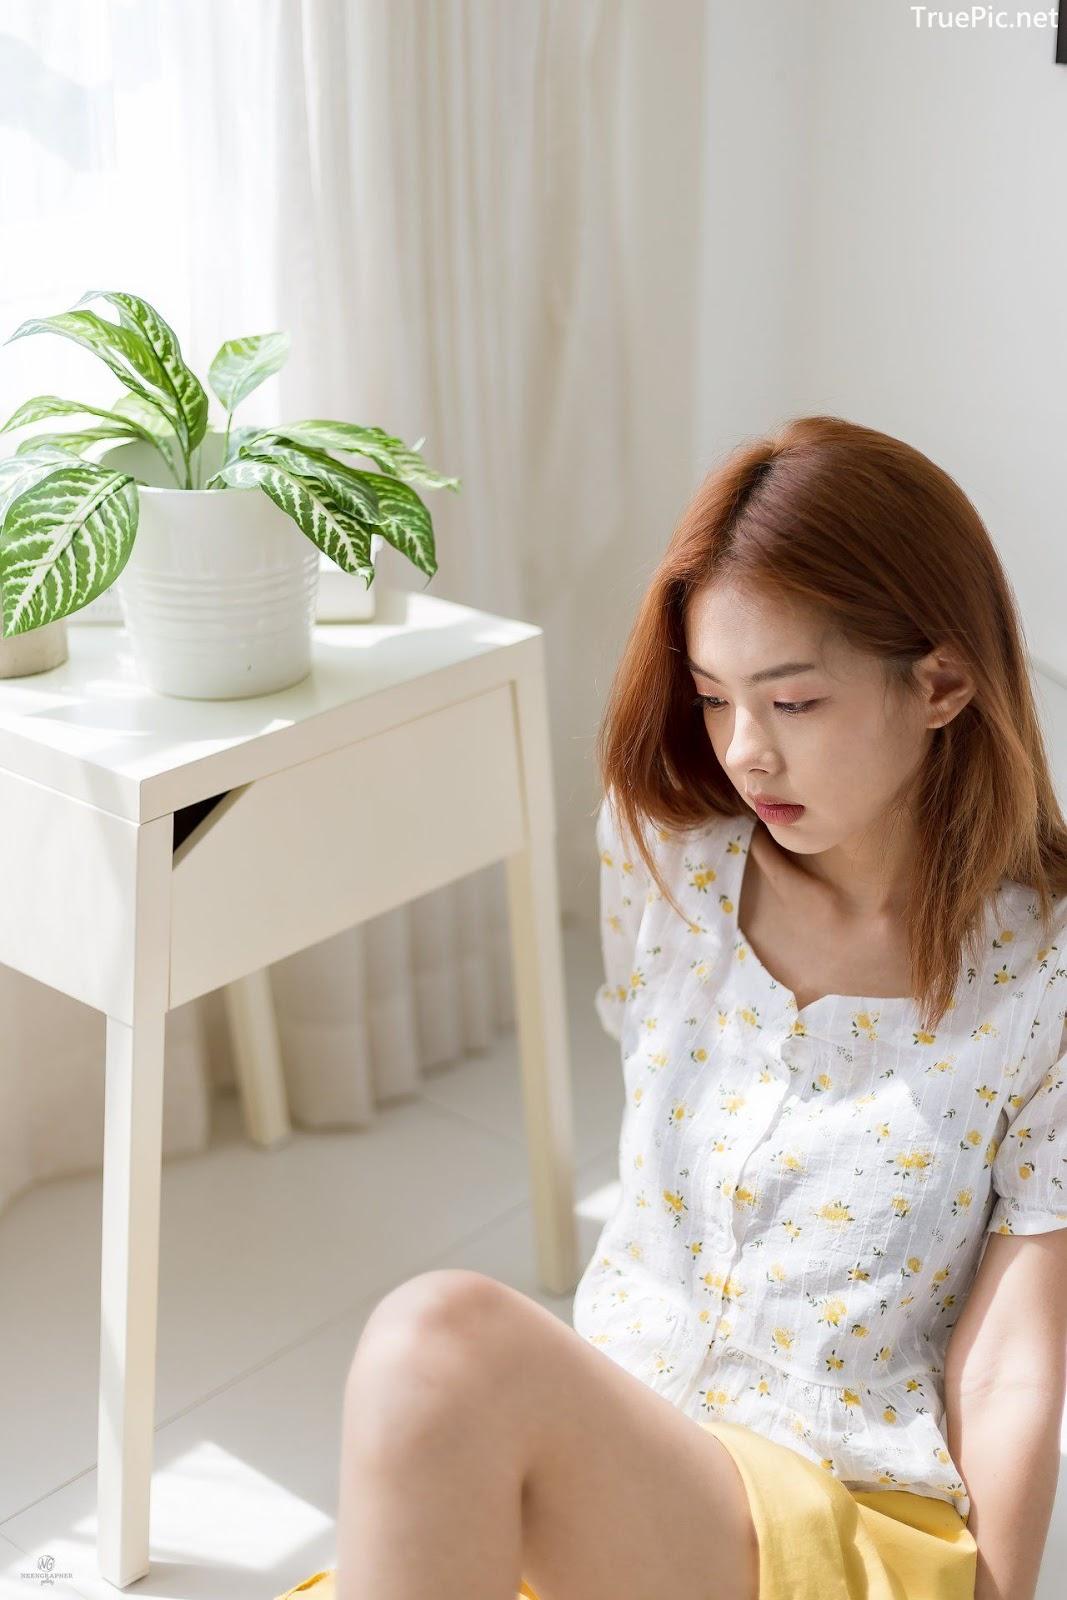 Image-Thailand-Angel-Model-Nut-Theerarat-White-Room-TruePic.net- Picture-9